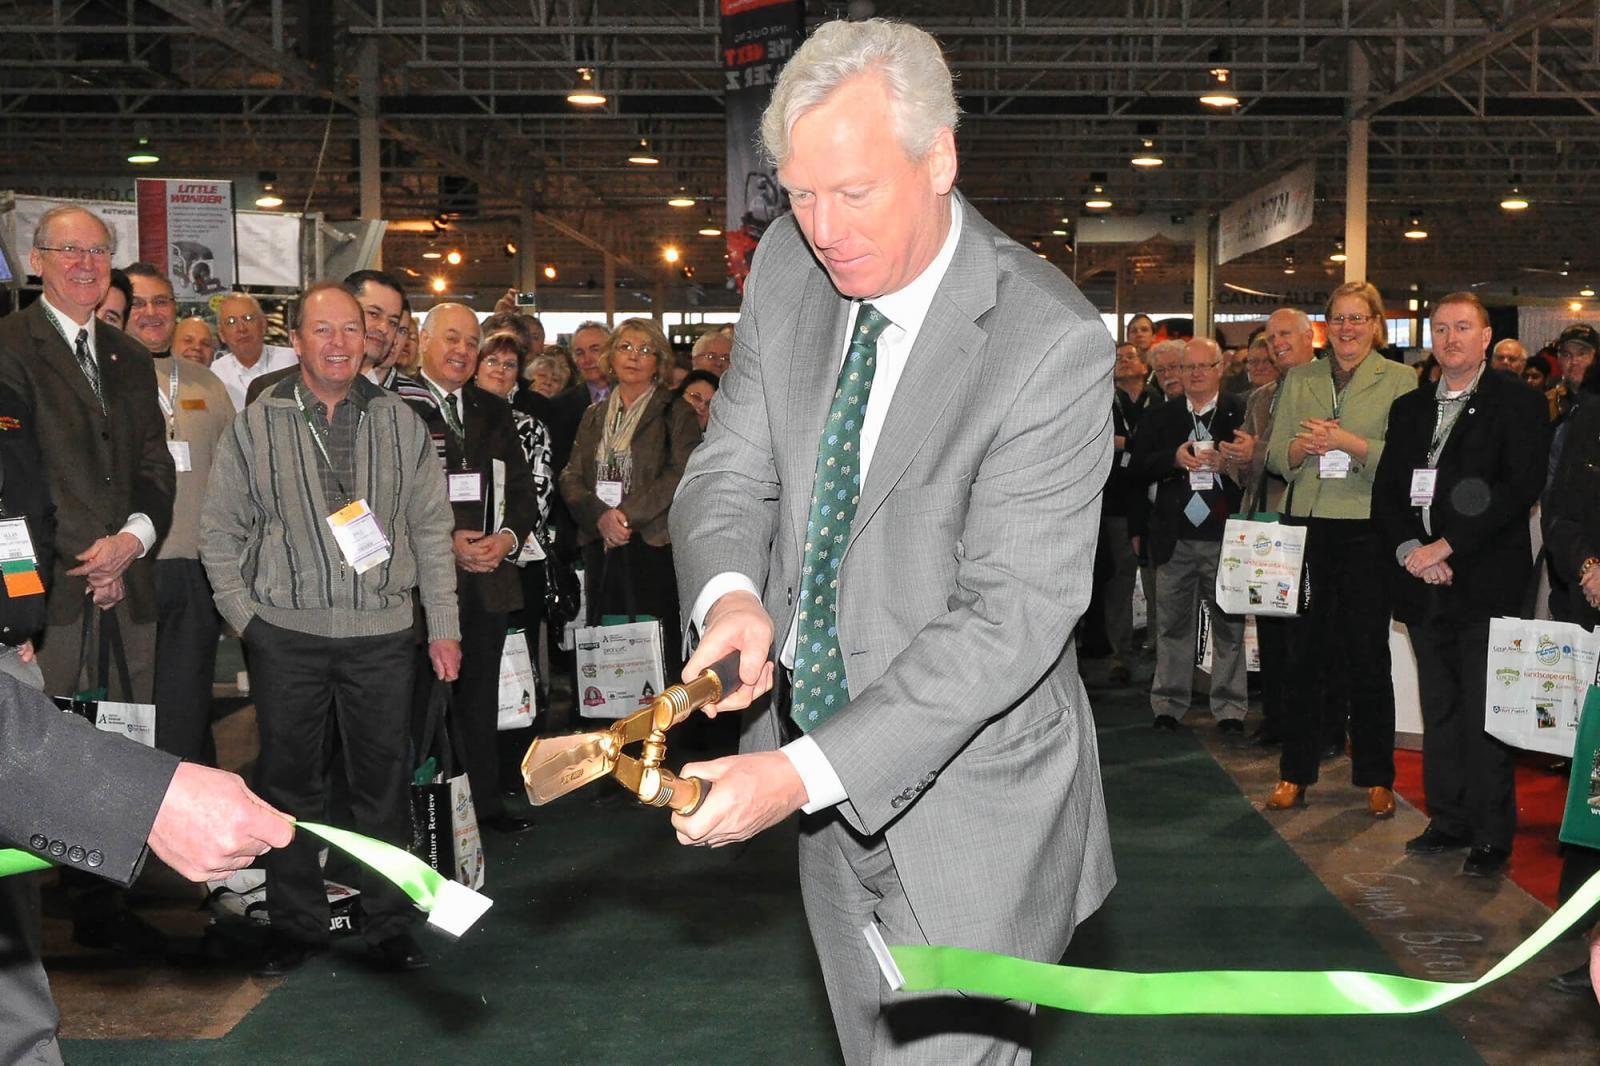 Toronto Mayor David Miller officially opens Congress.